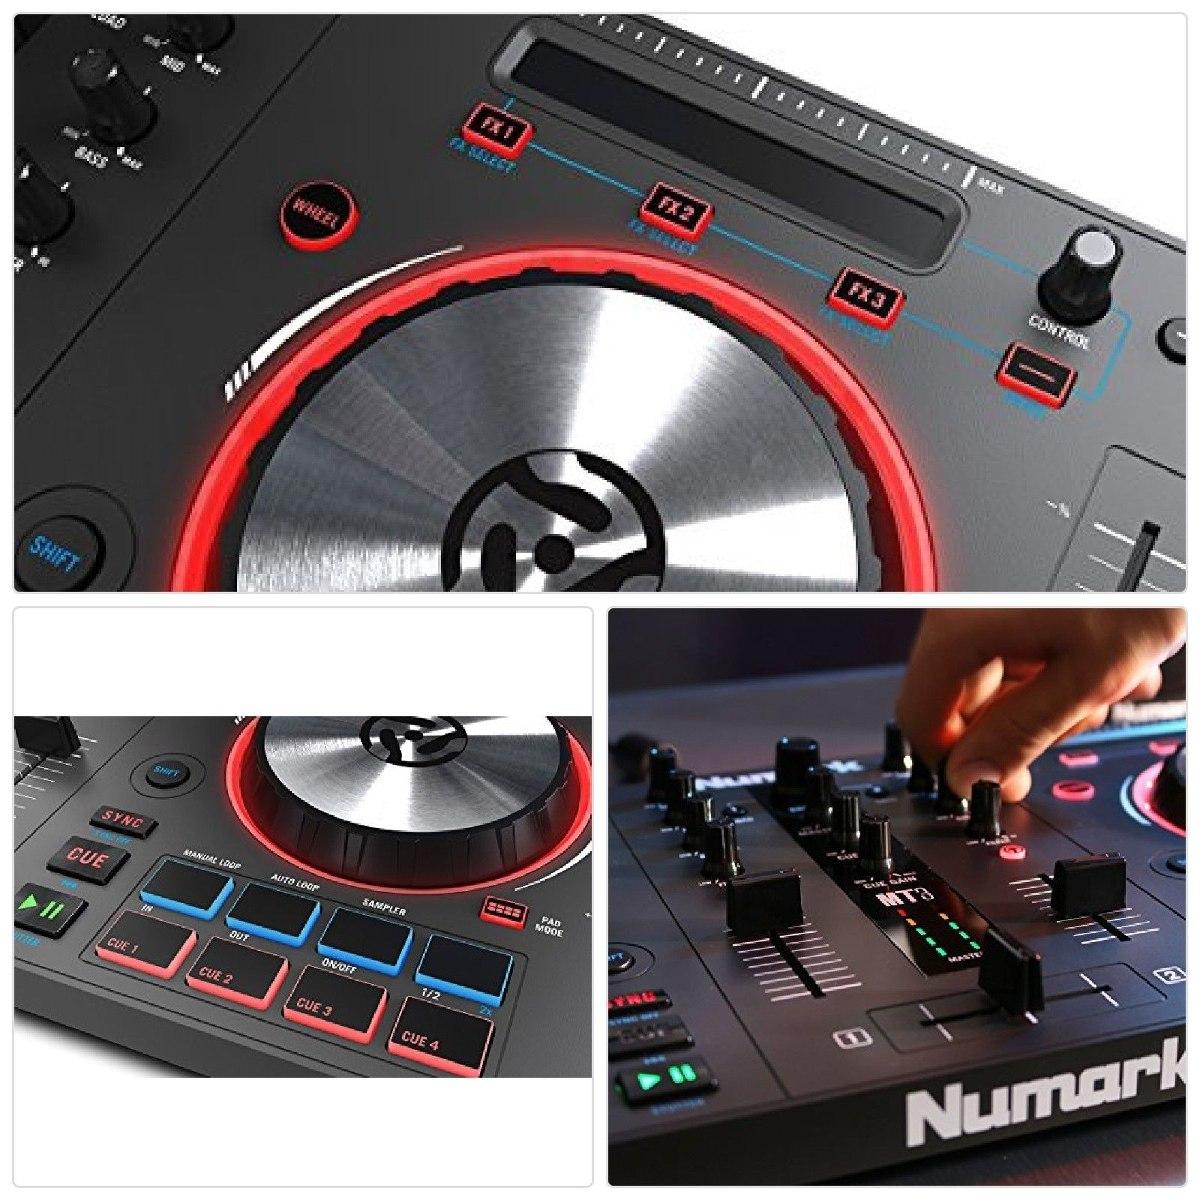 Numark Mixtrack 3 Dj Controller Jog Wheels Pro Dj Intro